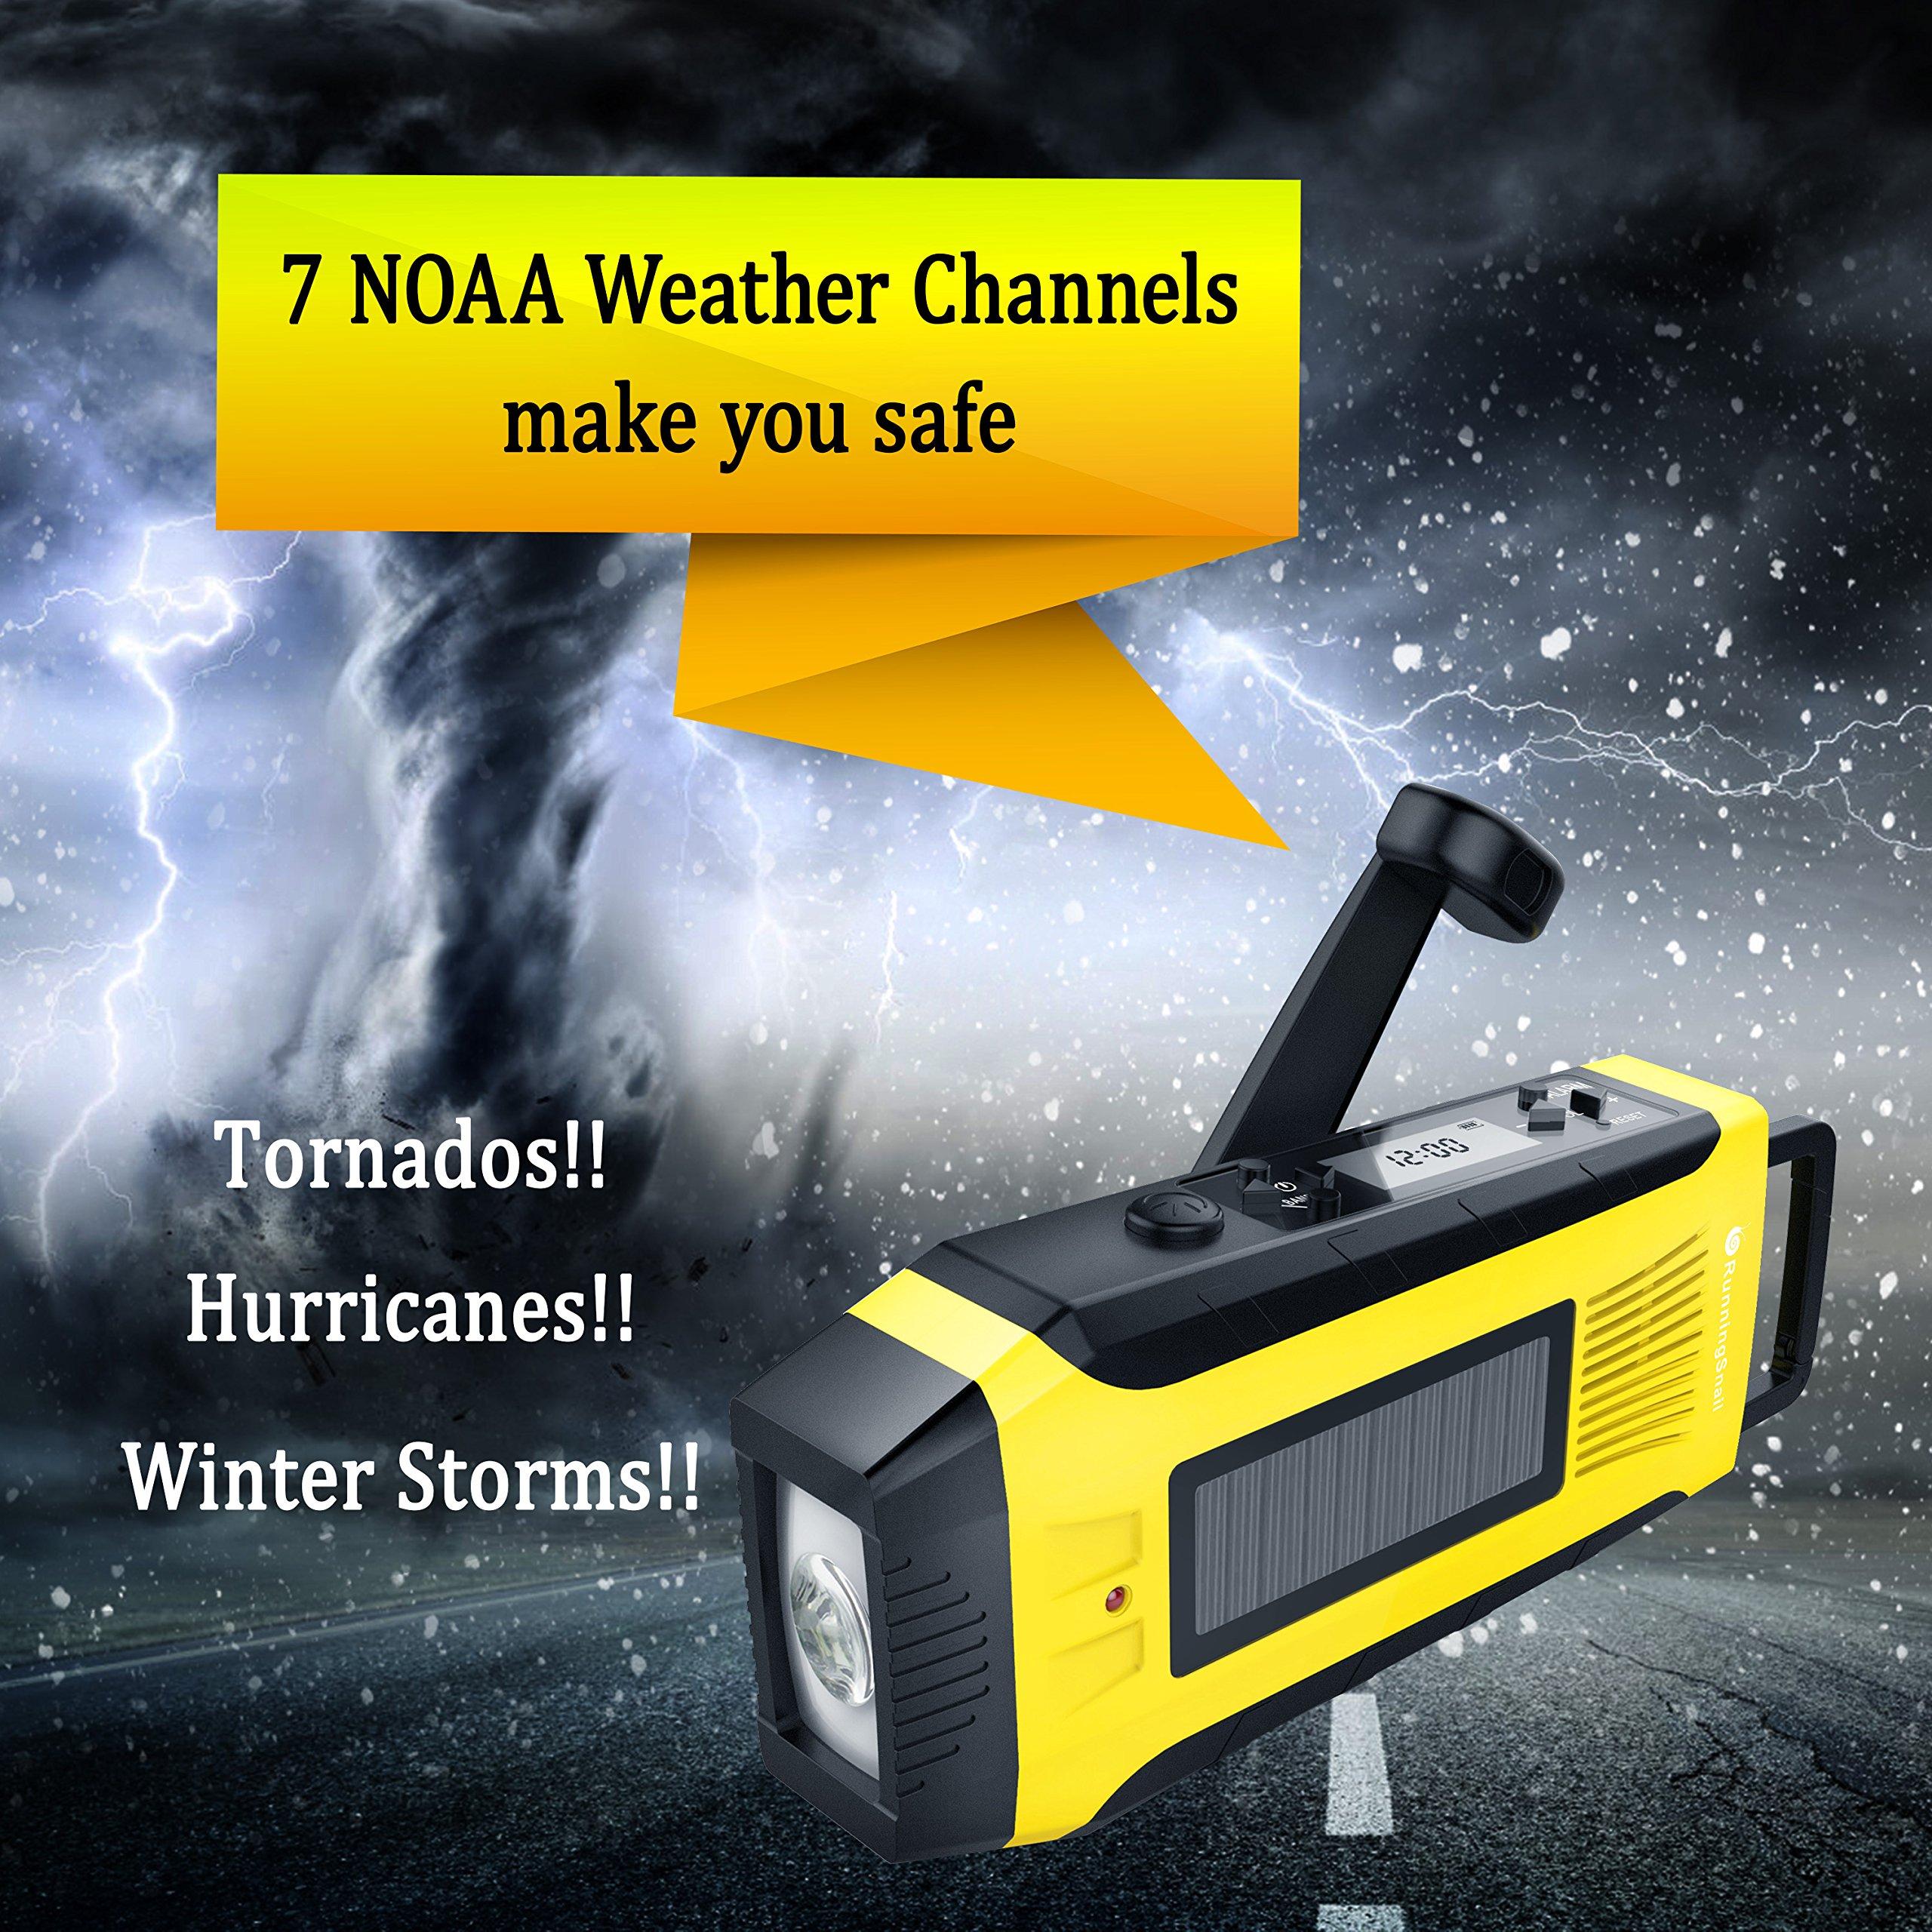 RunningSnail AM/FM NOAA Weather Emergency Solar Digital Crank Radio with 3W LED Flashlight, SOS Alarm & 2000MAh Power Bank(Yellow) … by RunningSnail (Image #2)